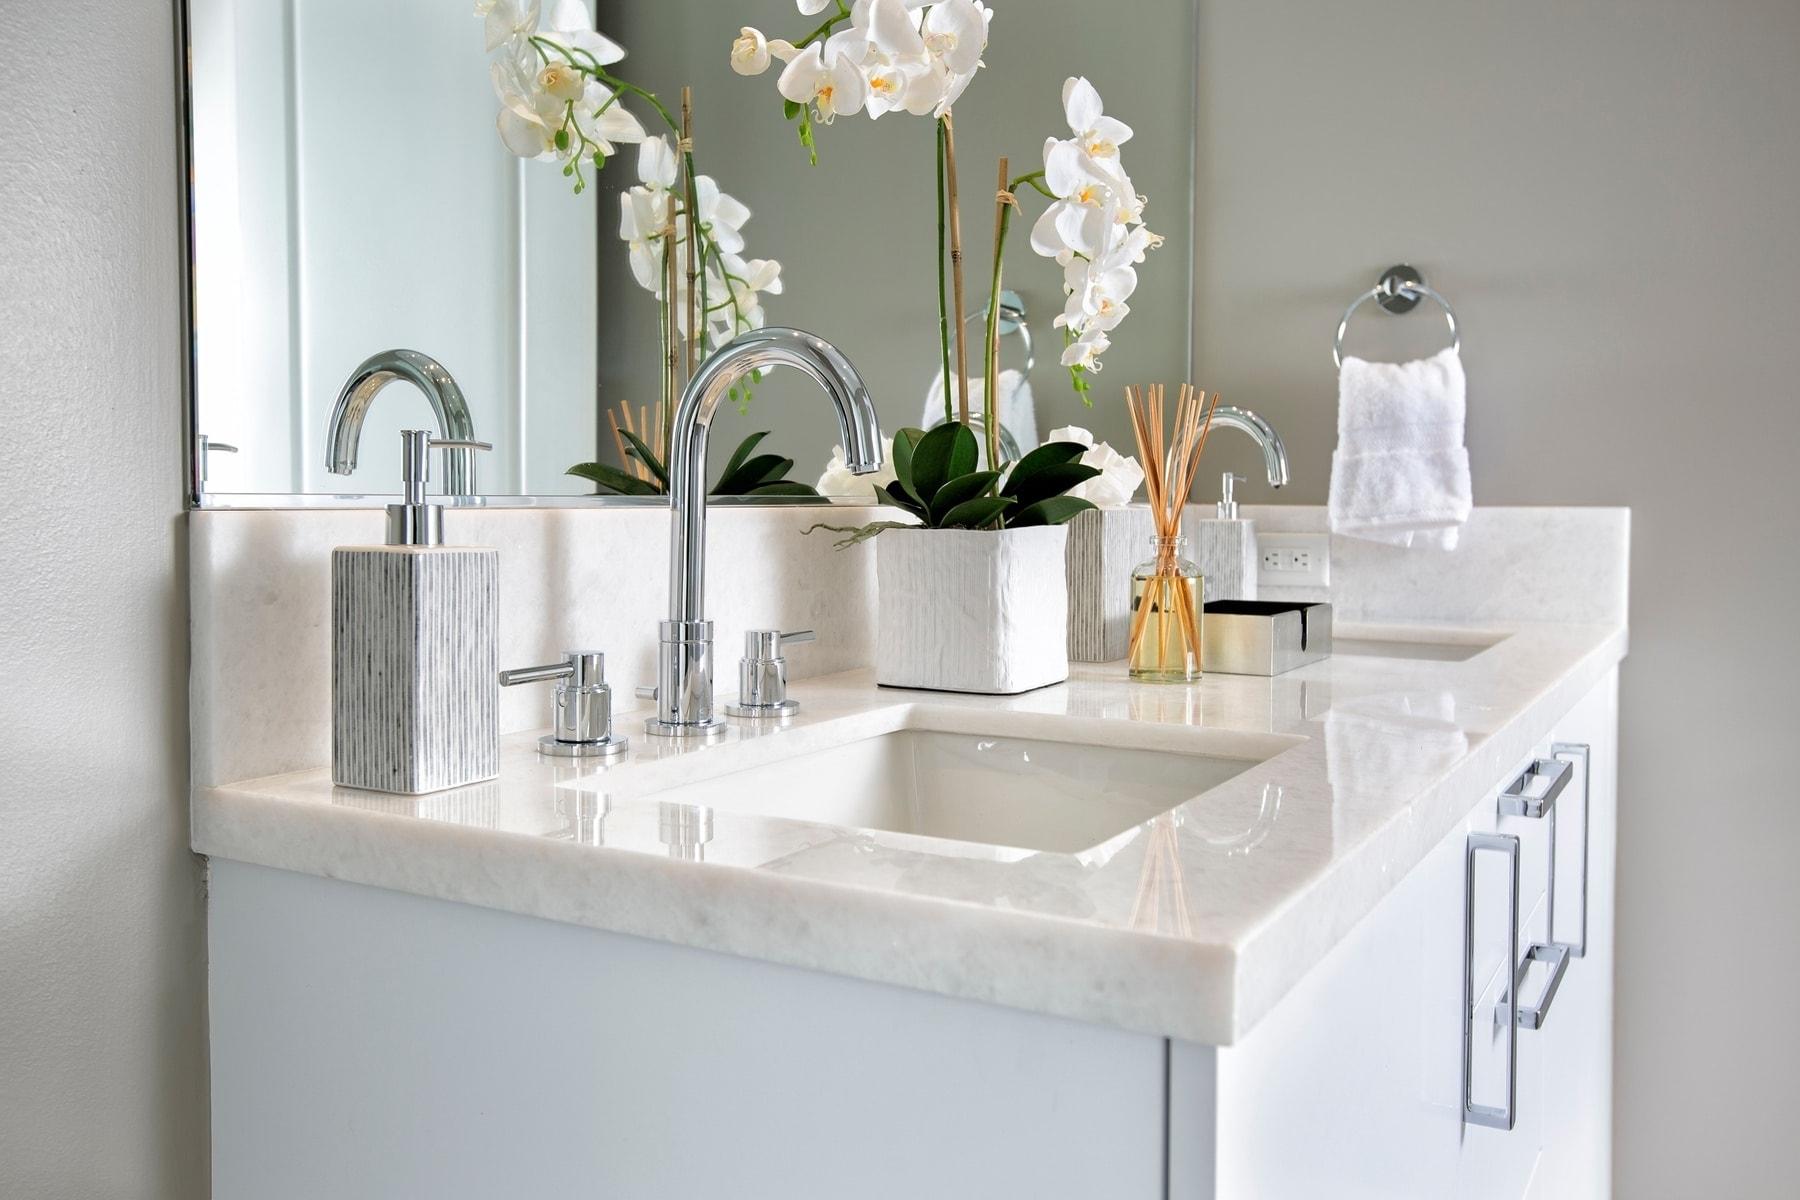 guest bath vanity in the model unit of arabella luxury condos in houston